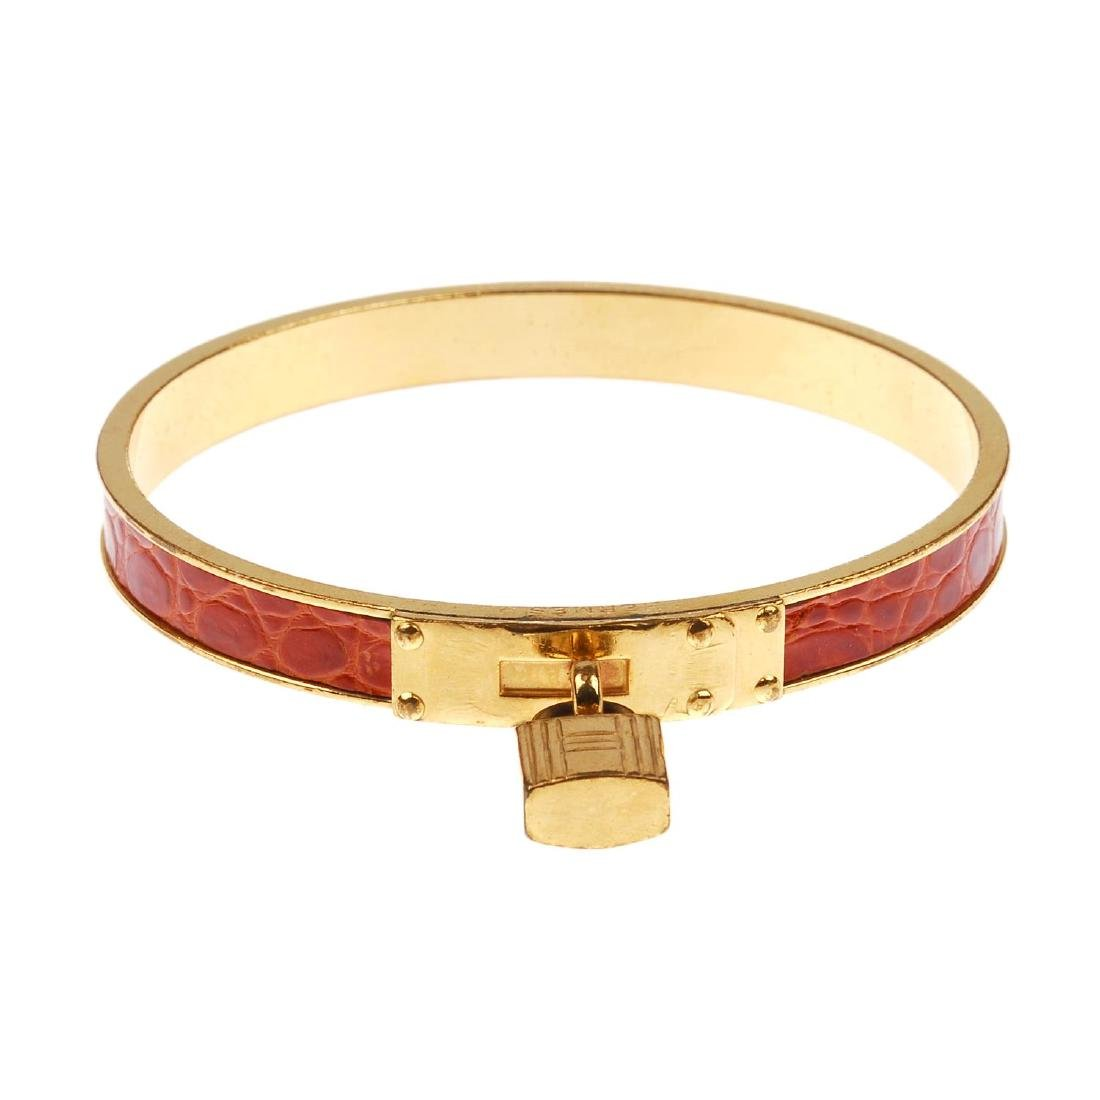 HERMÈS - a Kelly bangle. The circular gold-tone bangle